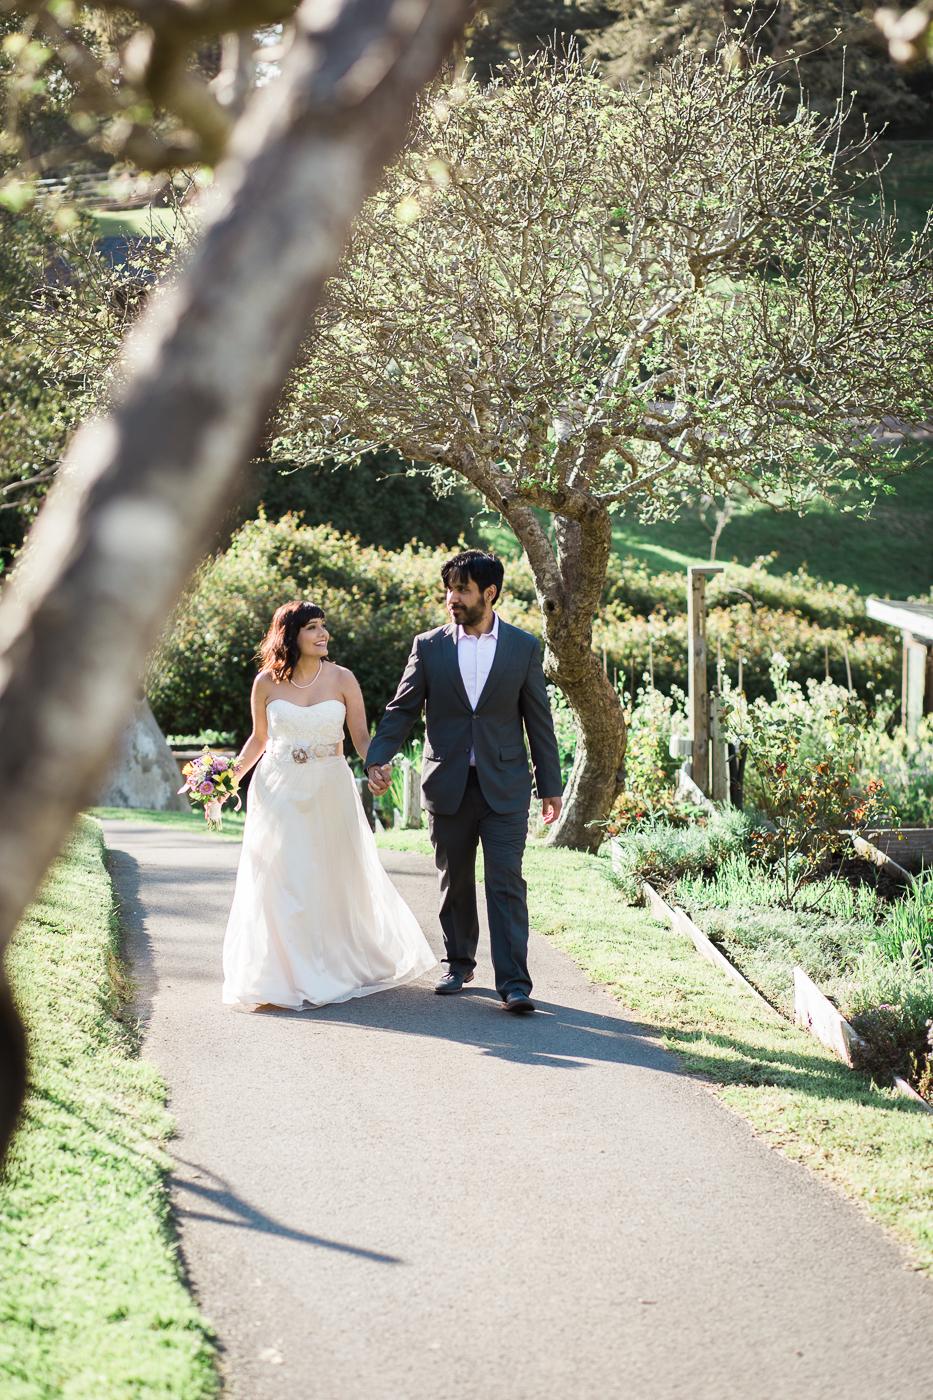 Mendocino-elopement-wedding-photographer-maria-villano